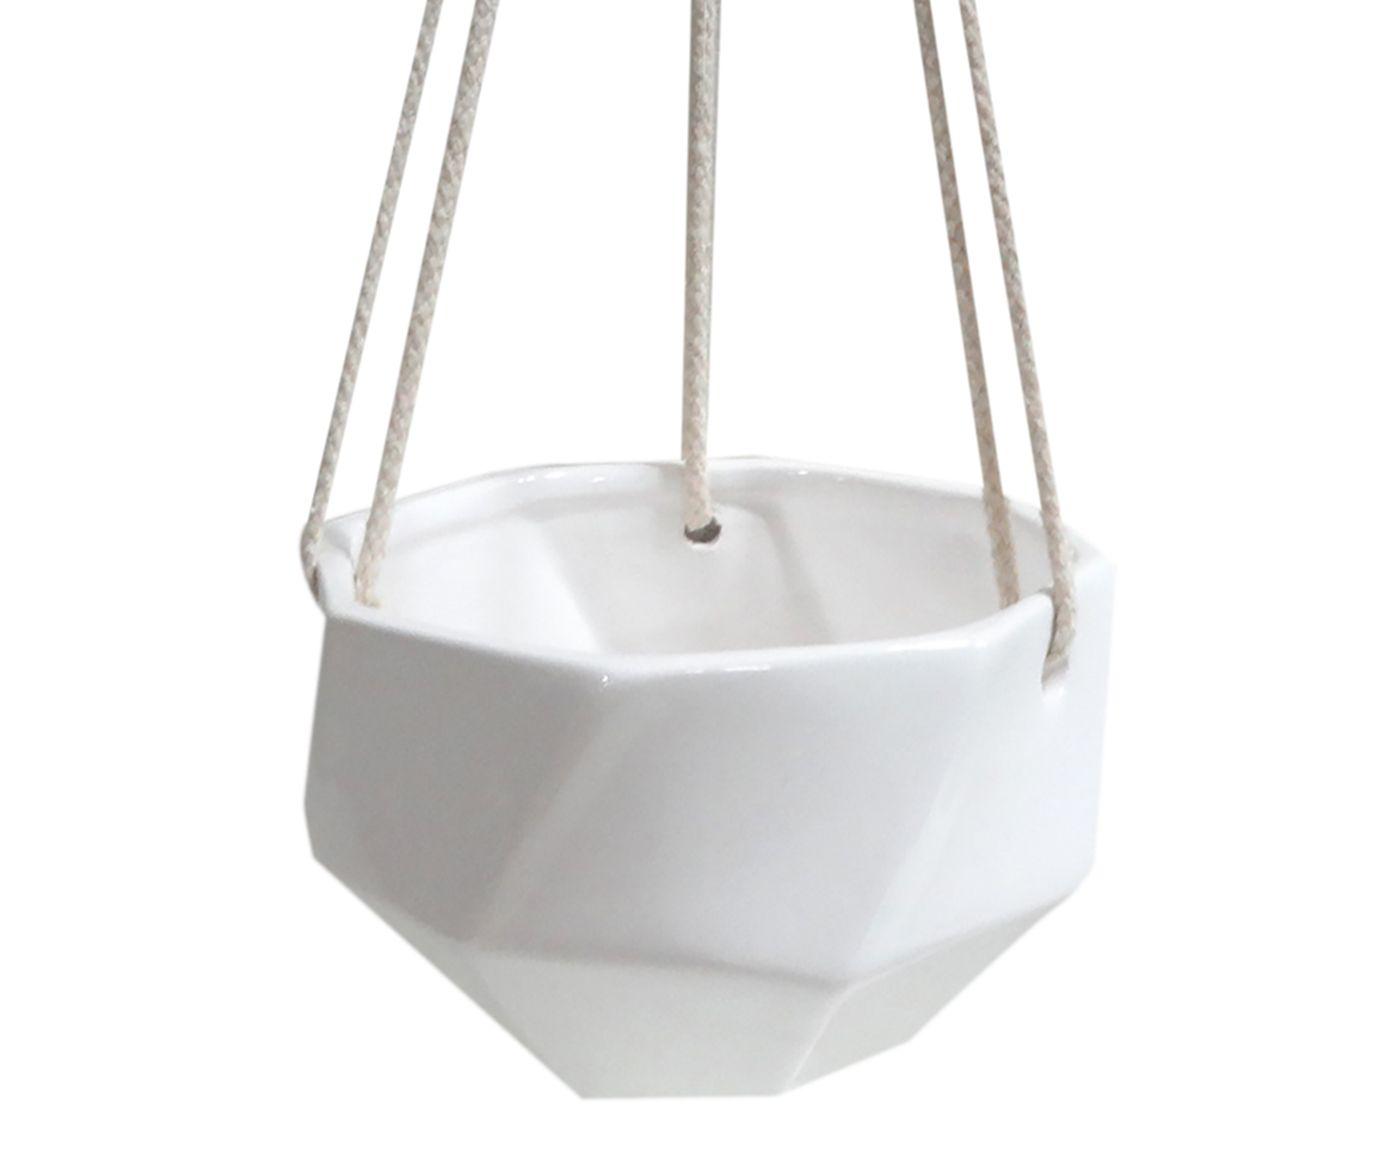 Hanger Octa Branco - 14X7X14cm   Westwing.com.br